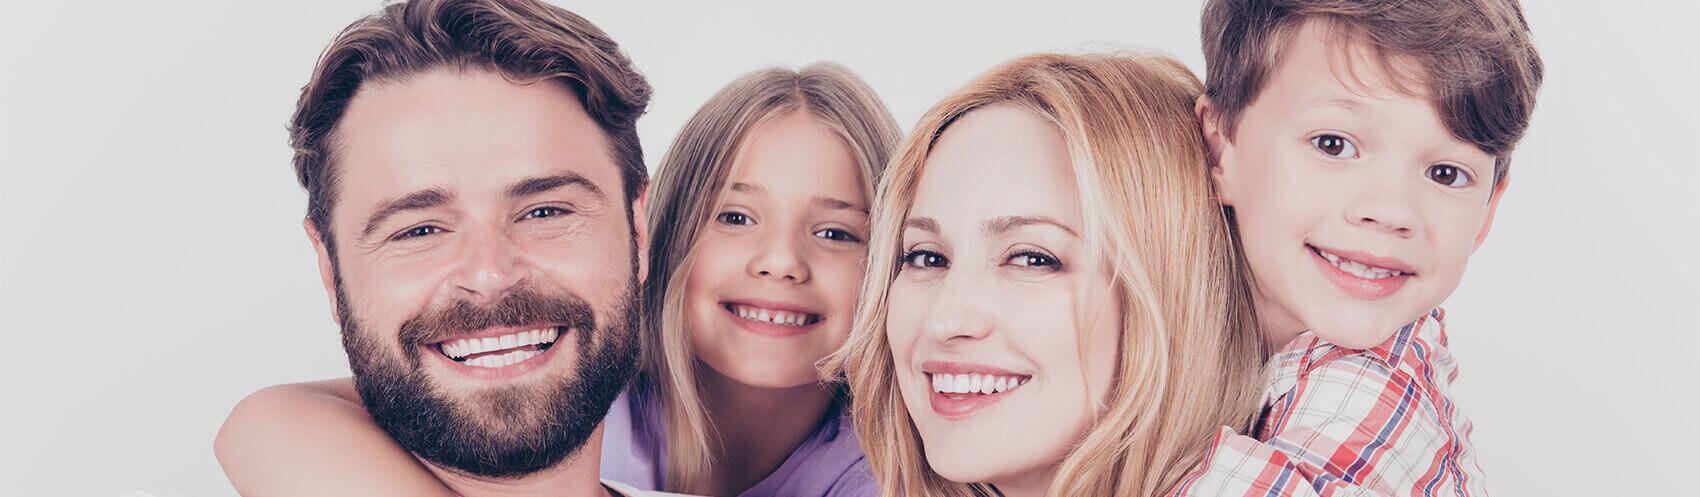 San Antonio Family Dentistry